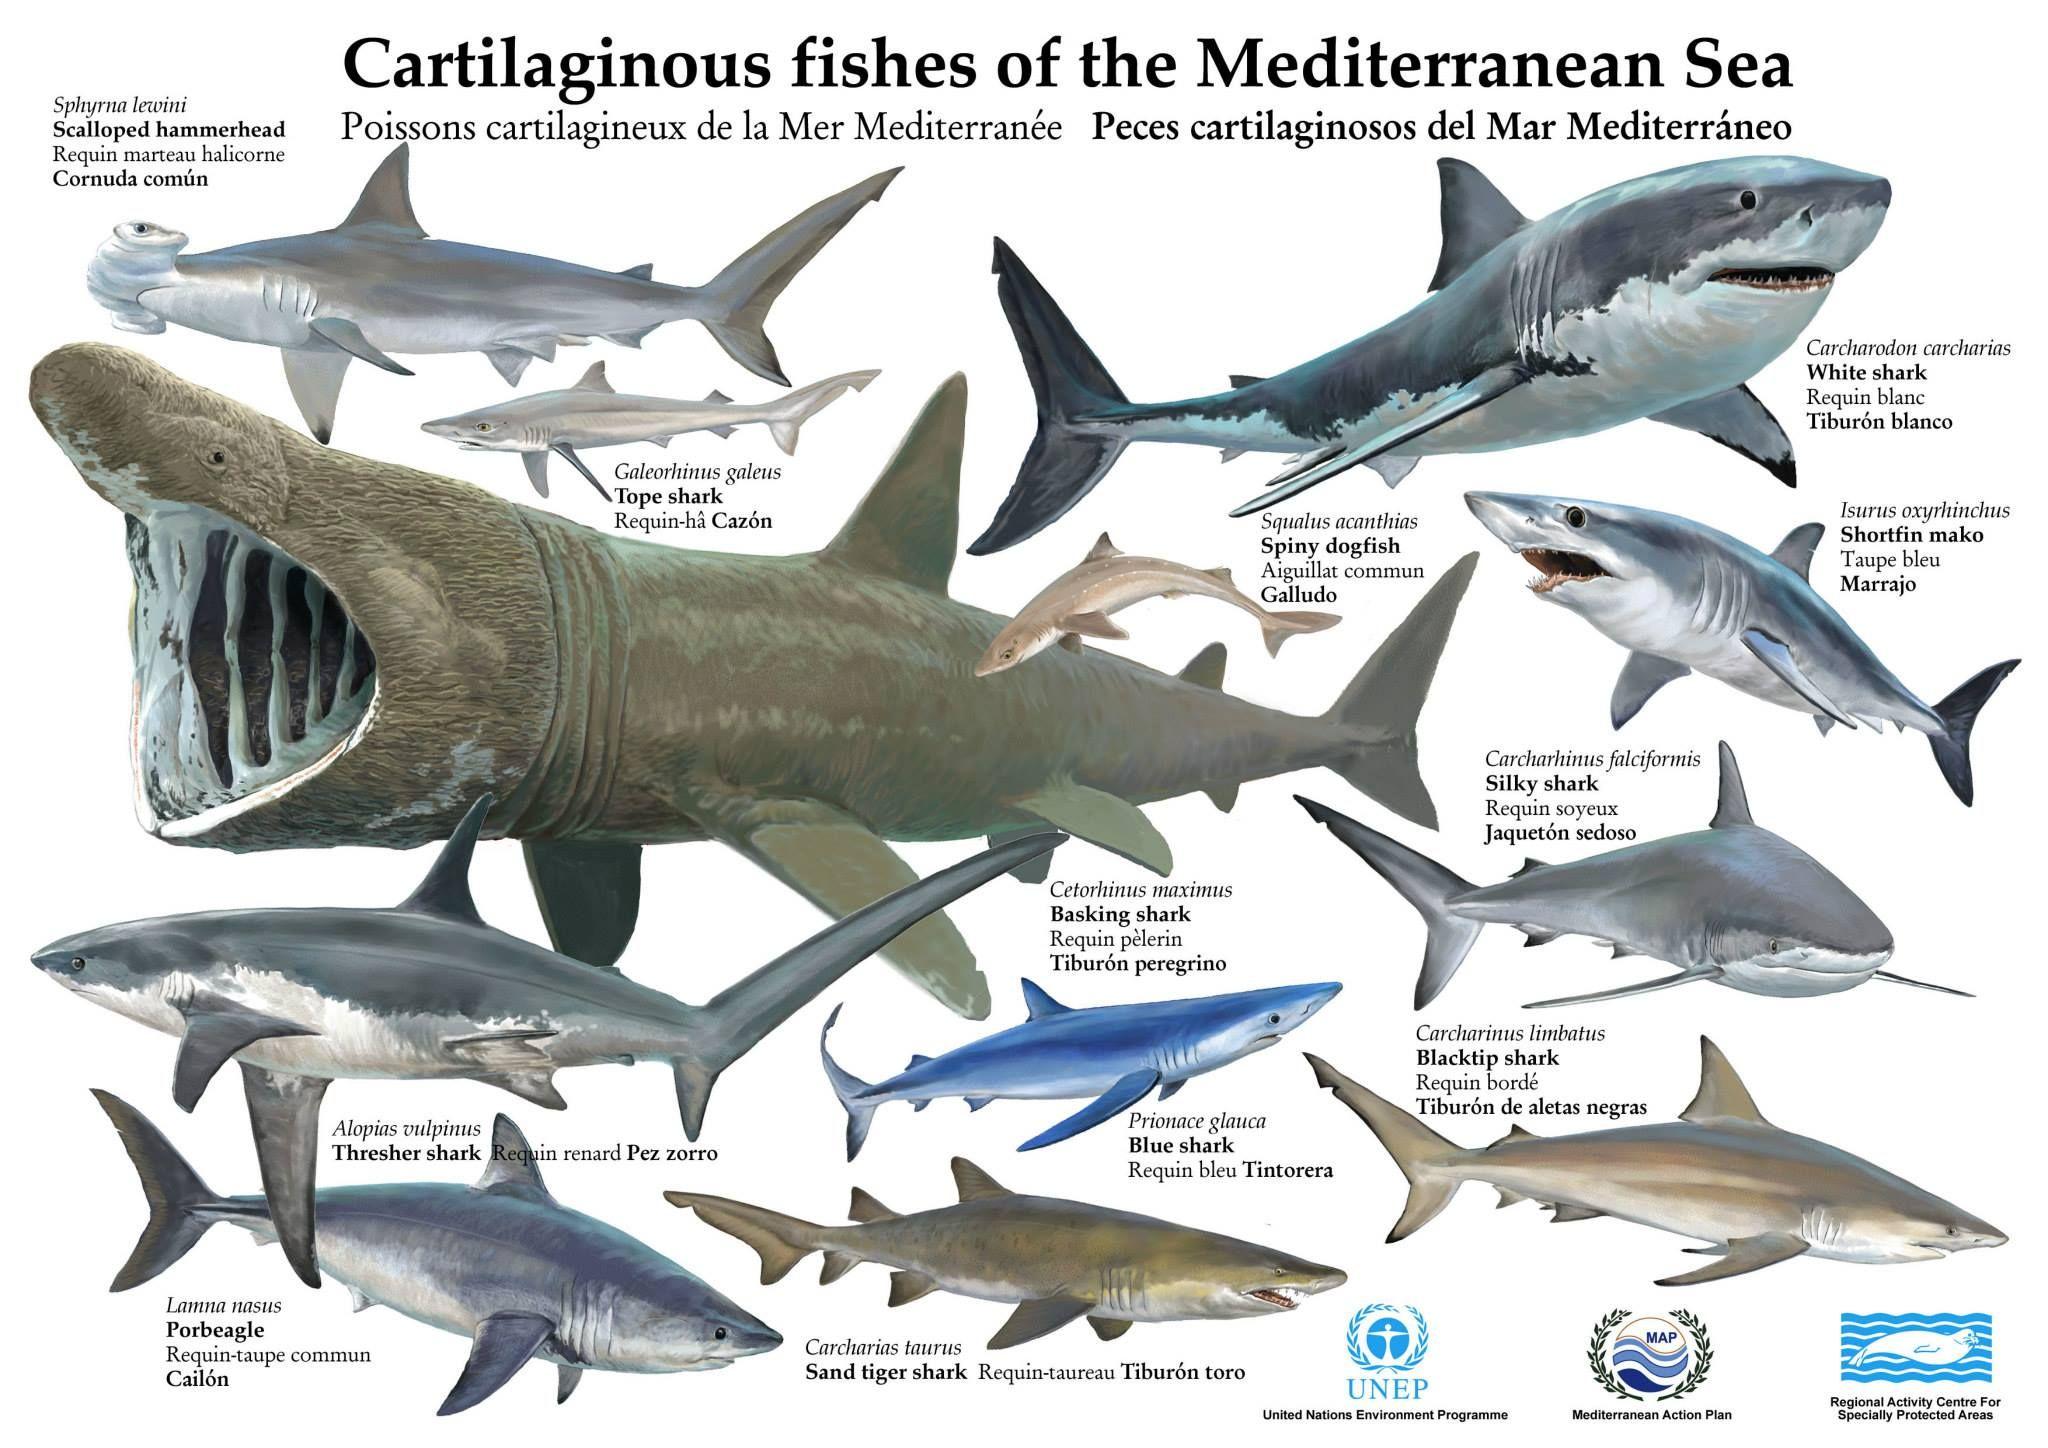 épinglé Par Requin Blanc Sur Requins Especies De Tiburones